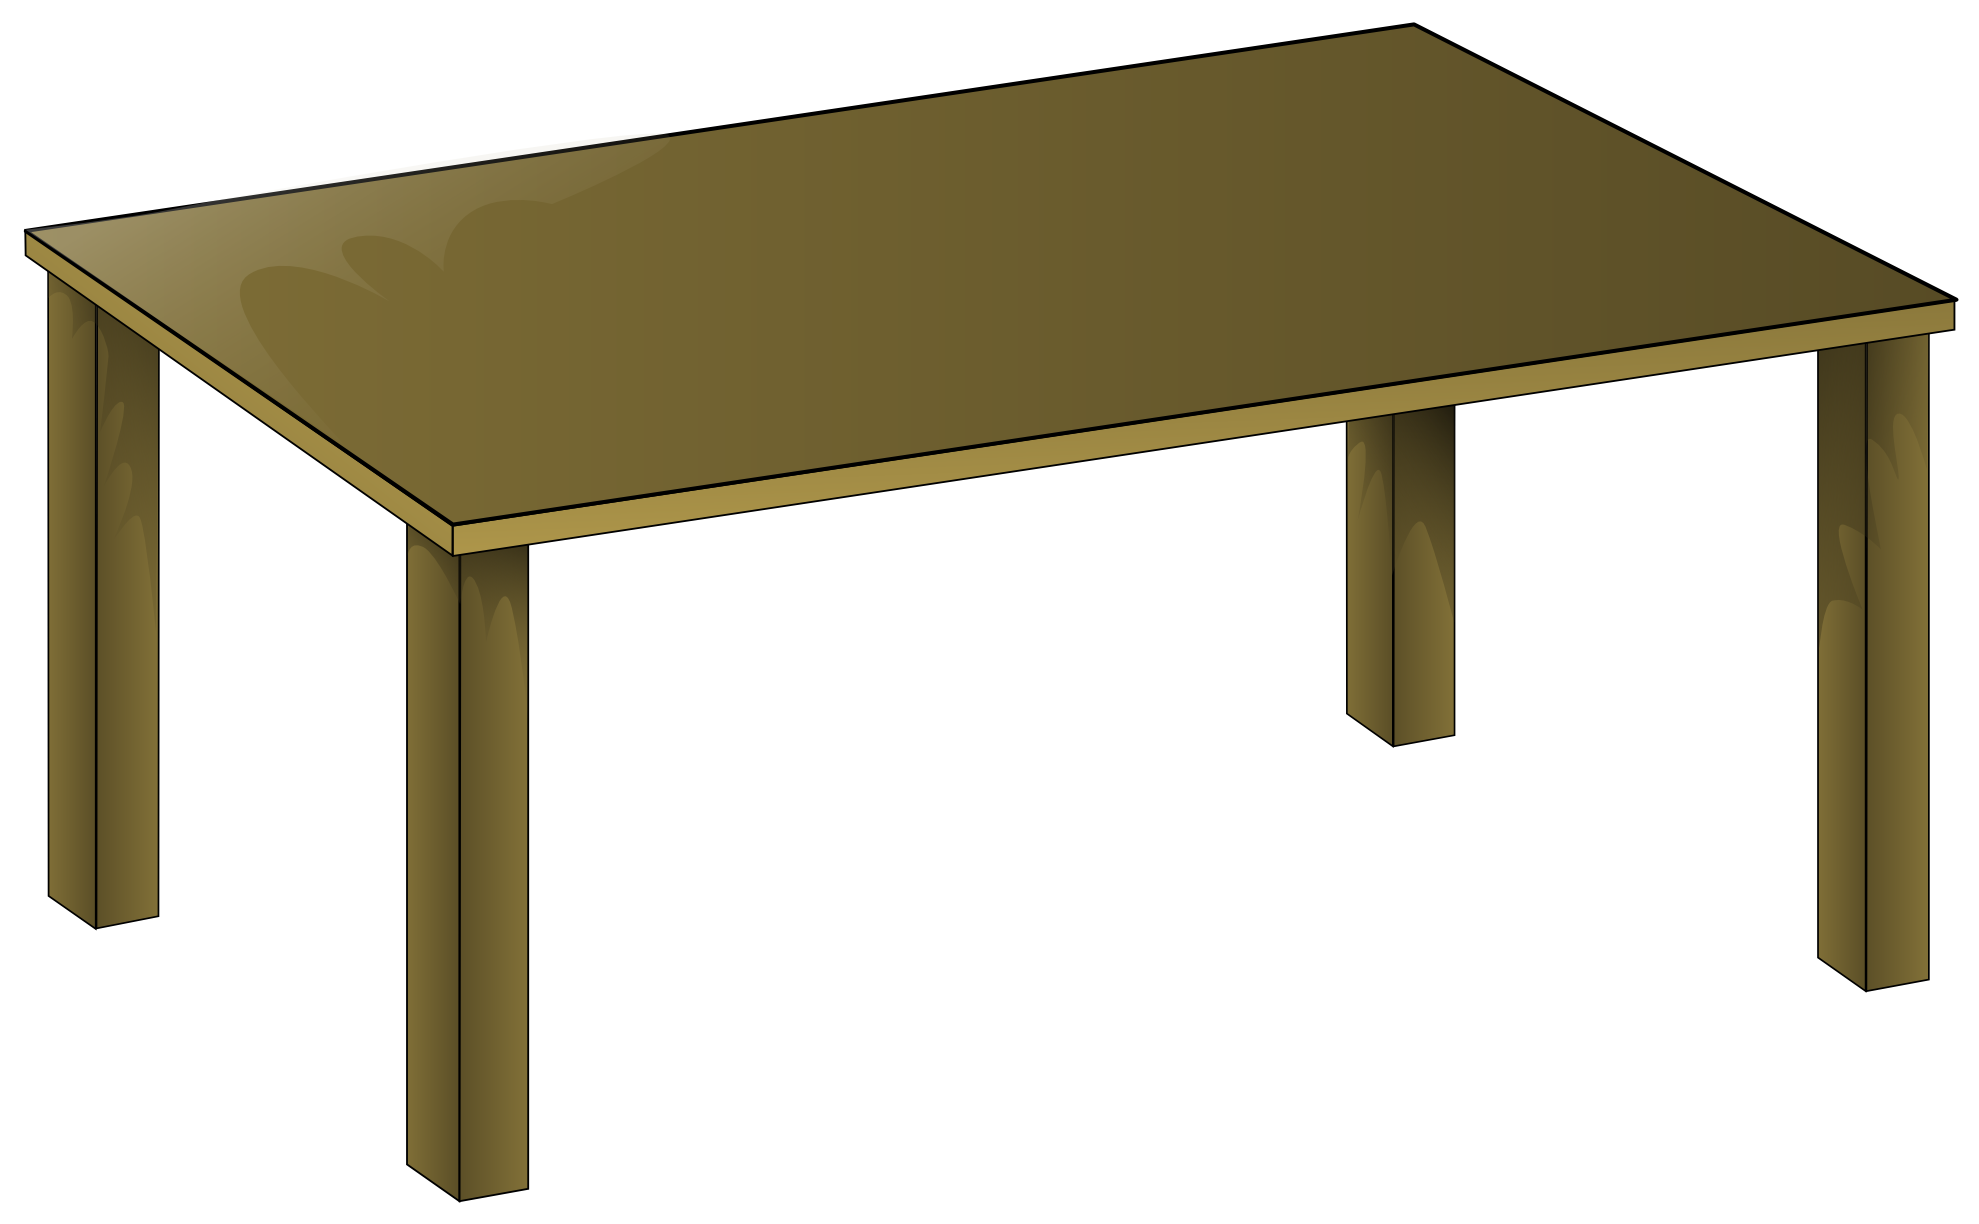 round table clip art u0026mid - Table Clip Art